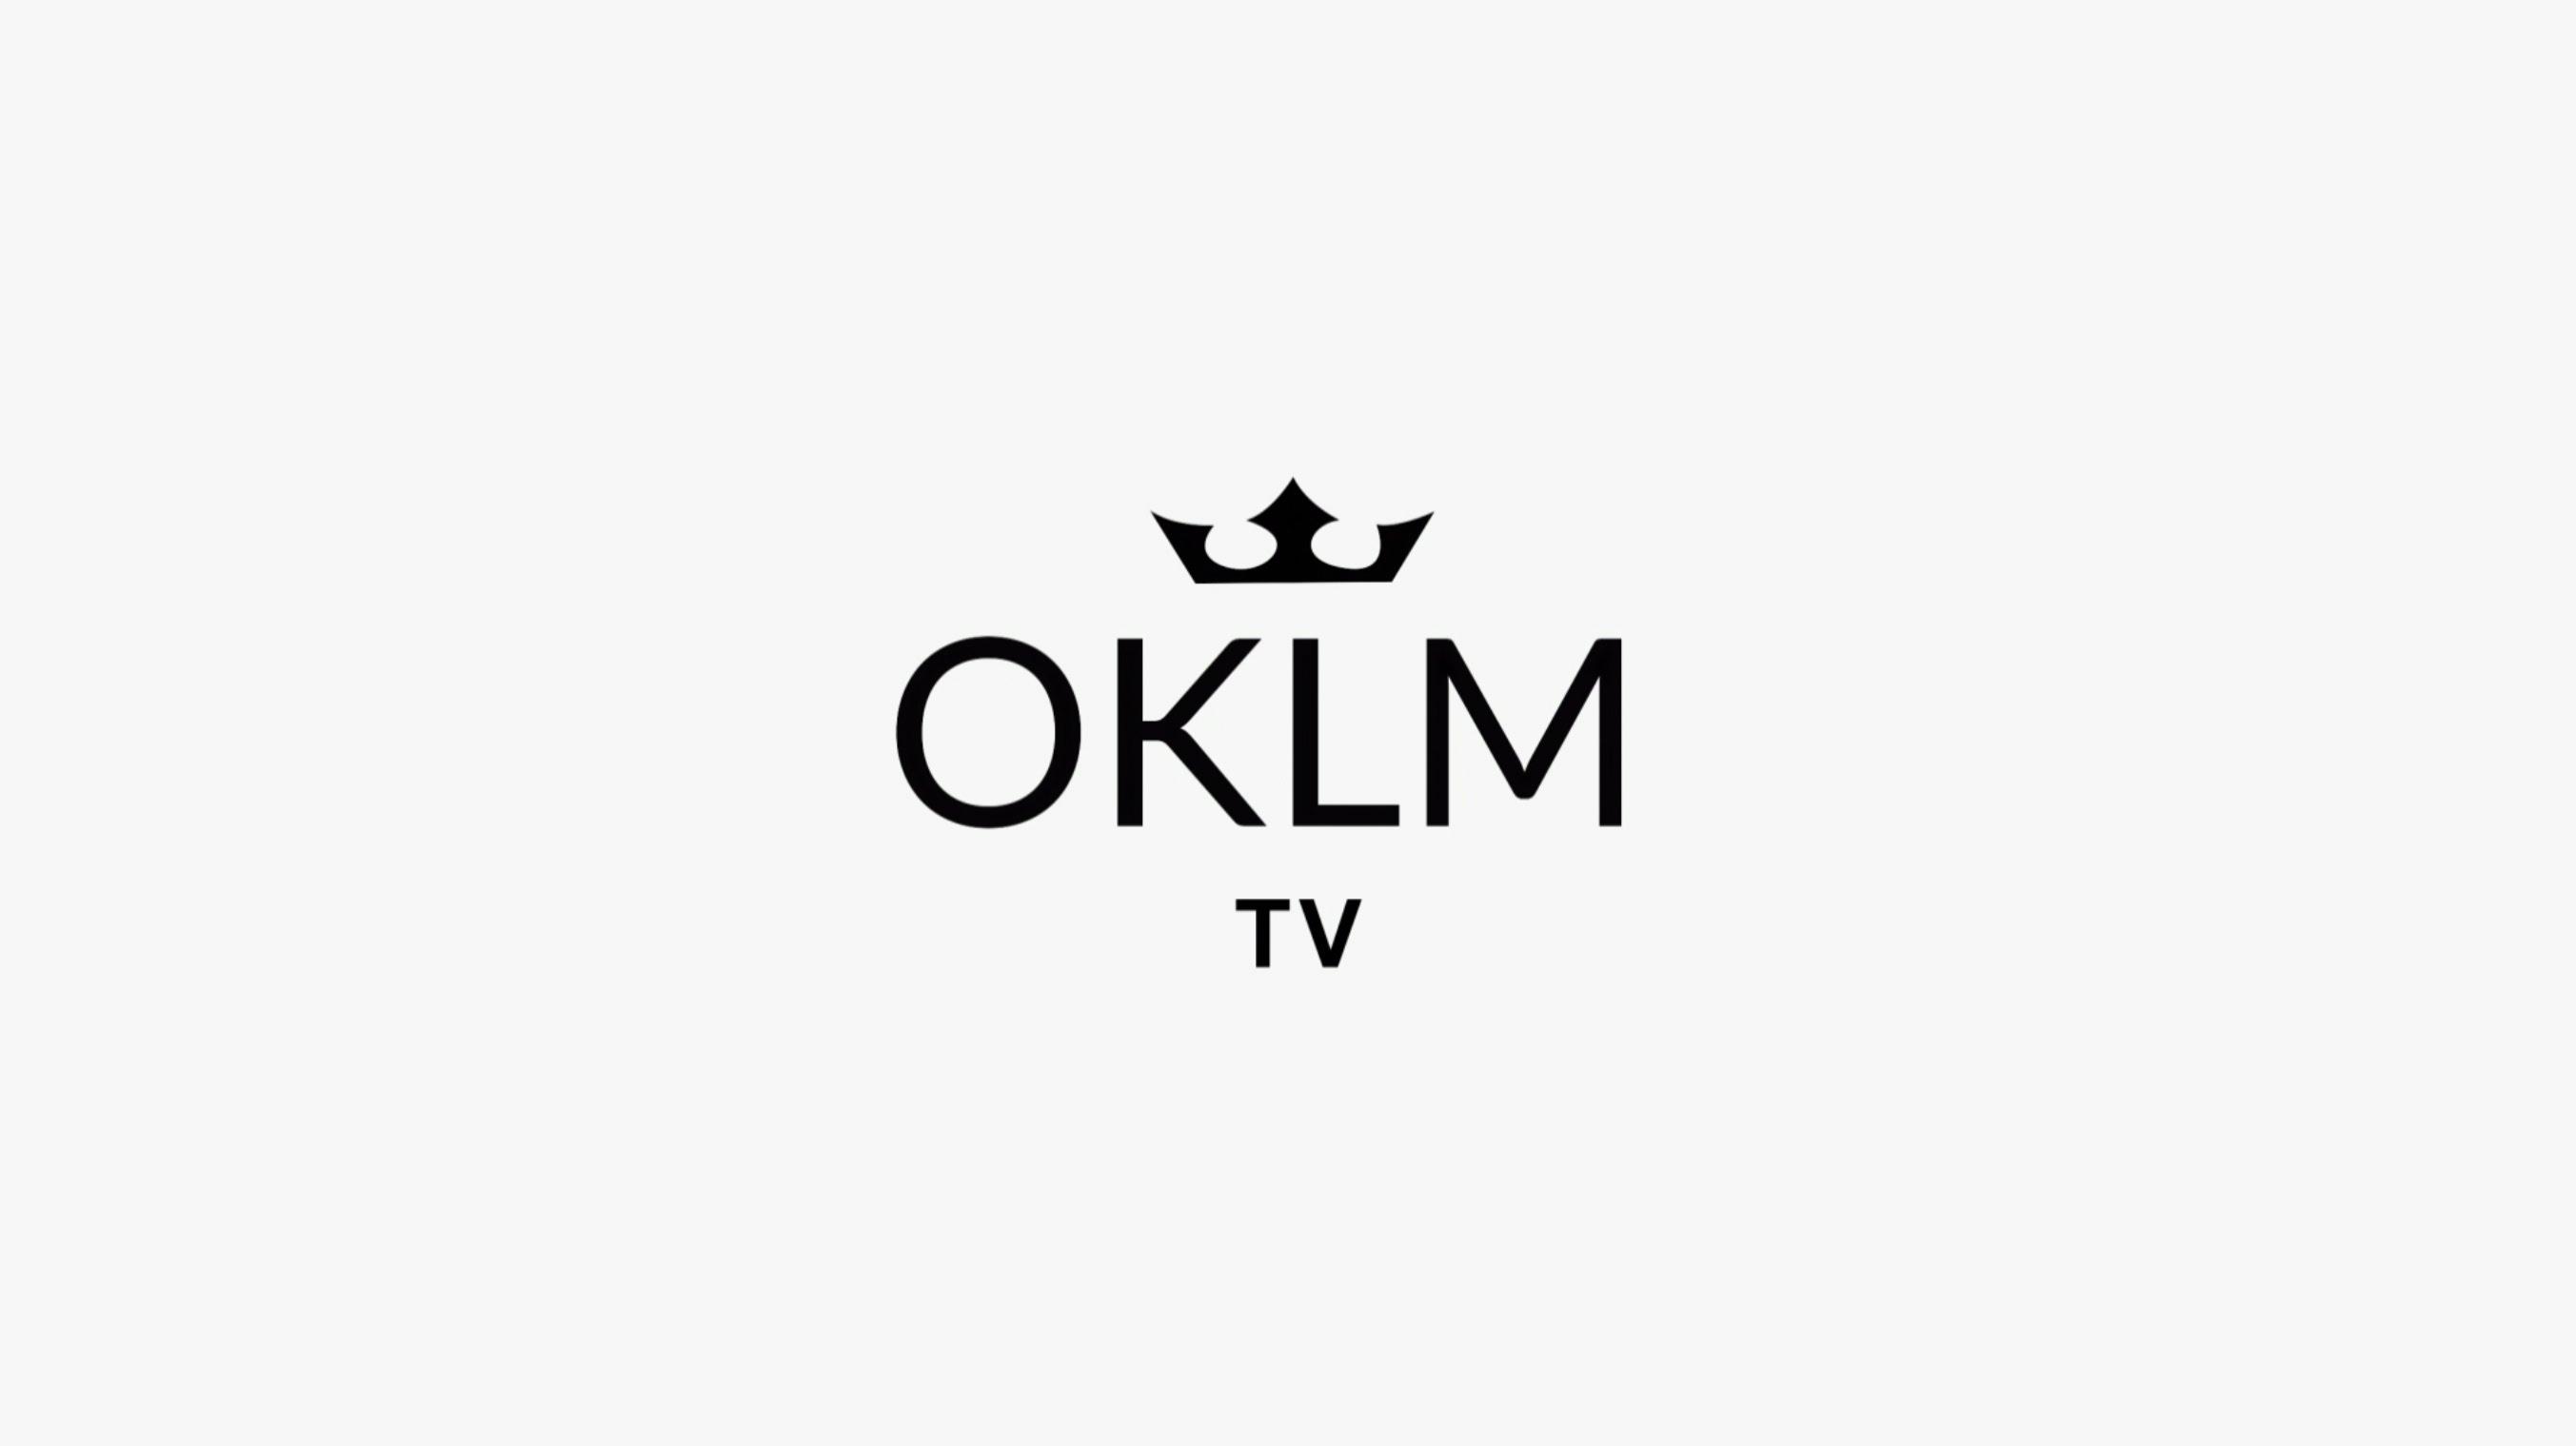 © OKLM TV